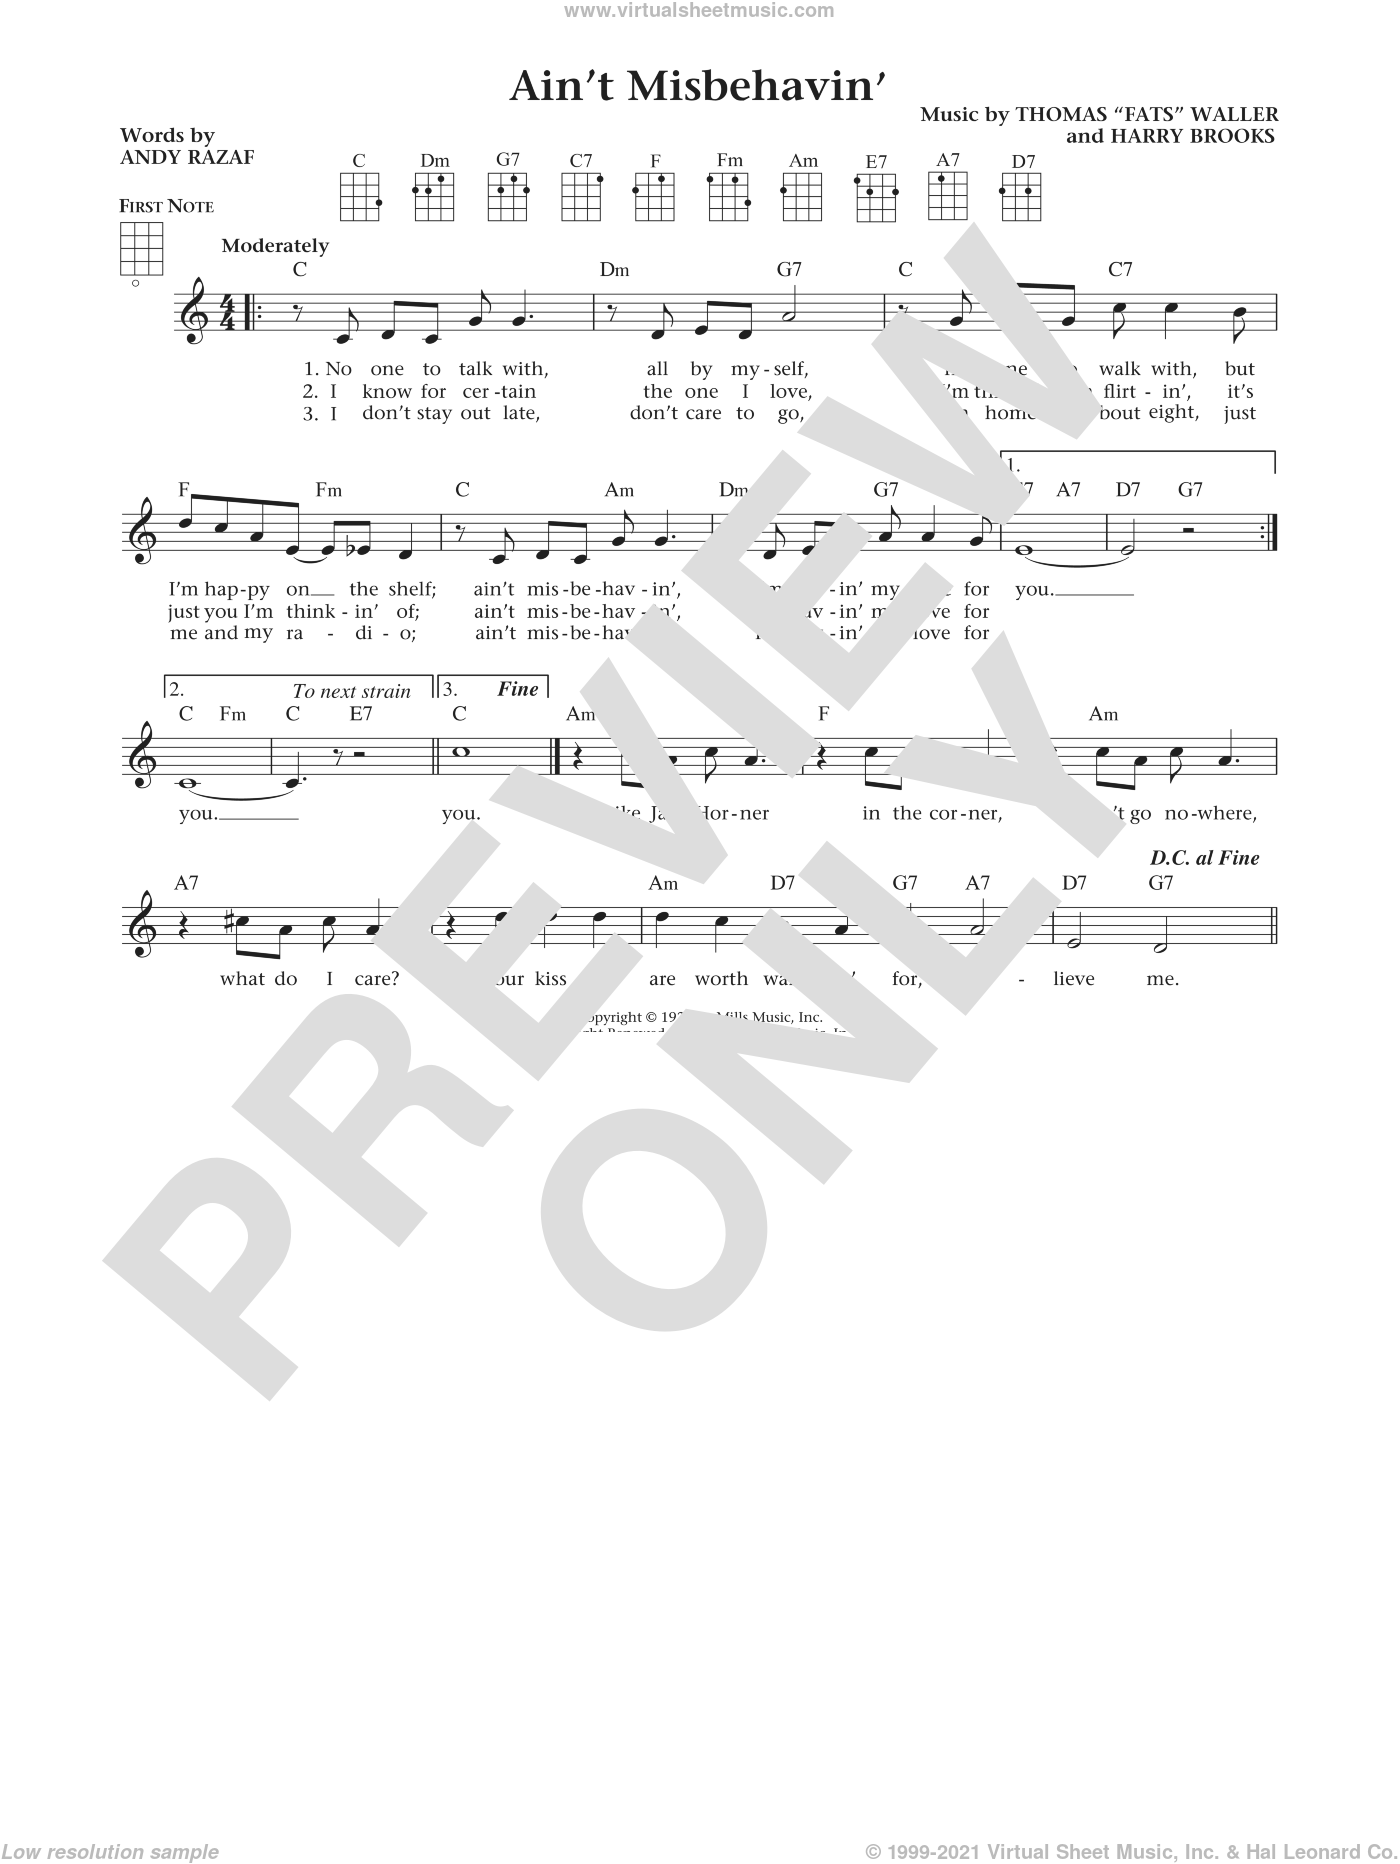 Ain't Misbehavin' (from The Daily Ukulele) (arr. Liz and Jim Beloff) sheet music for ukulele by Hank Williams, Jr., Jim Beloff, Liz Beloff, Andy Razaf, Thomas Waller and Harry Brooks, intermediate skill level